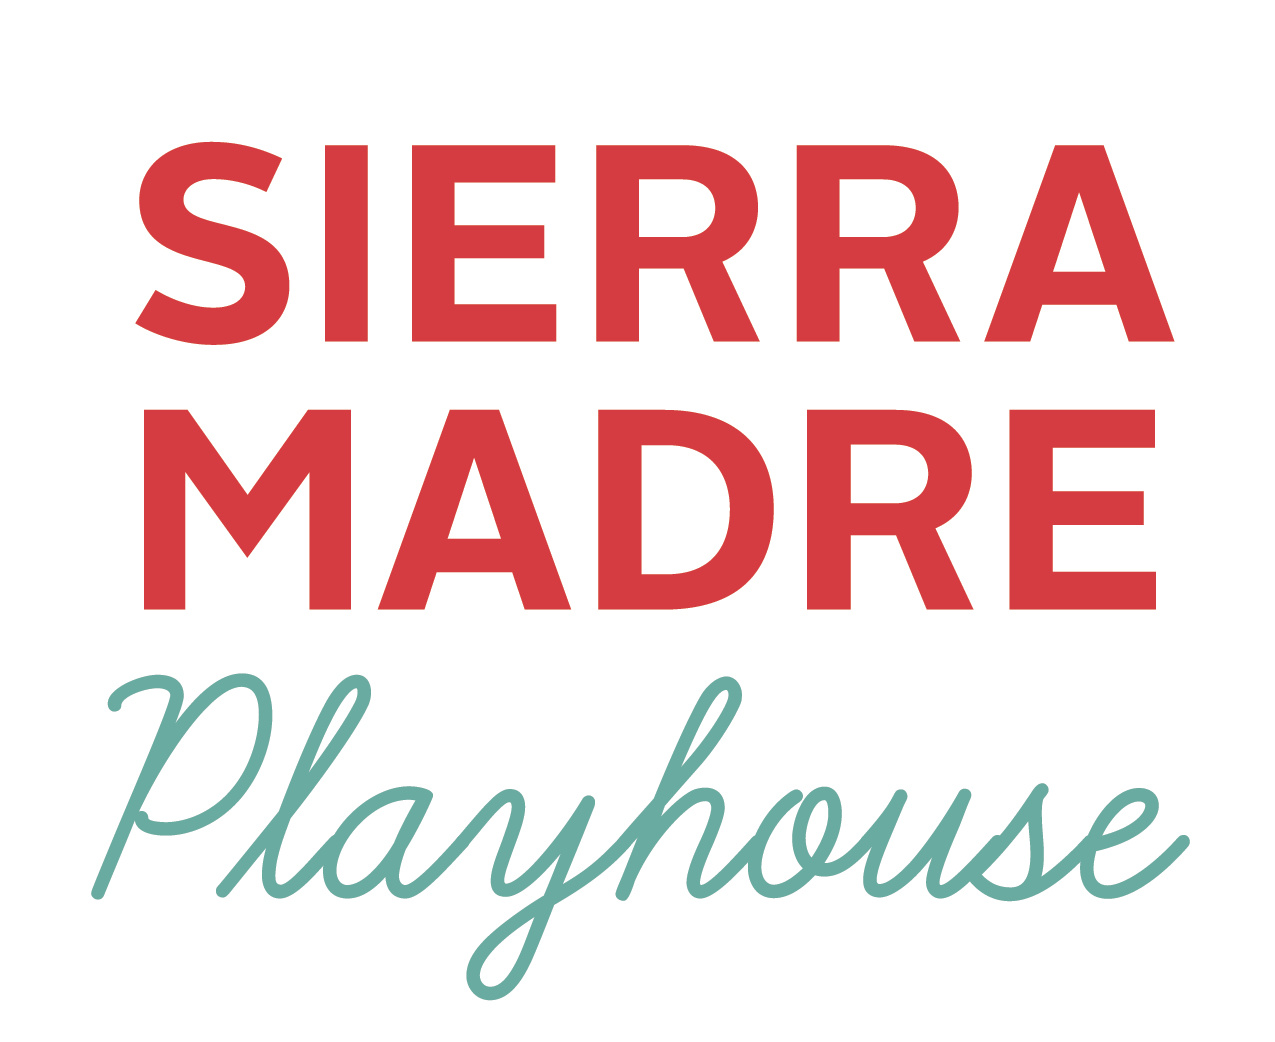 Sierra Madre Playhouse